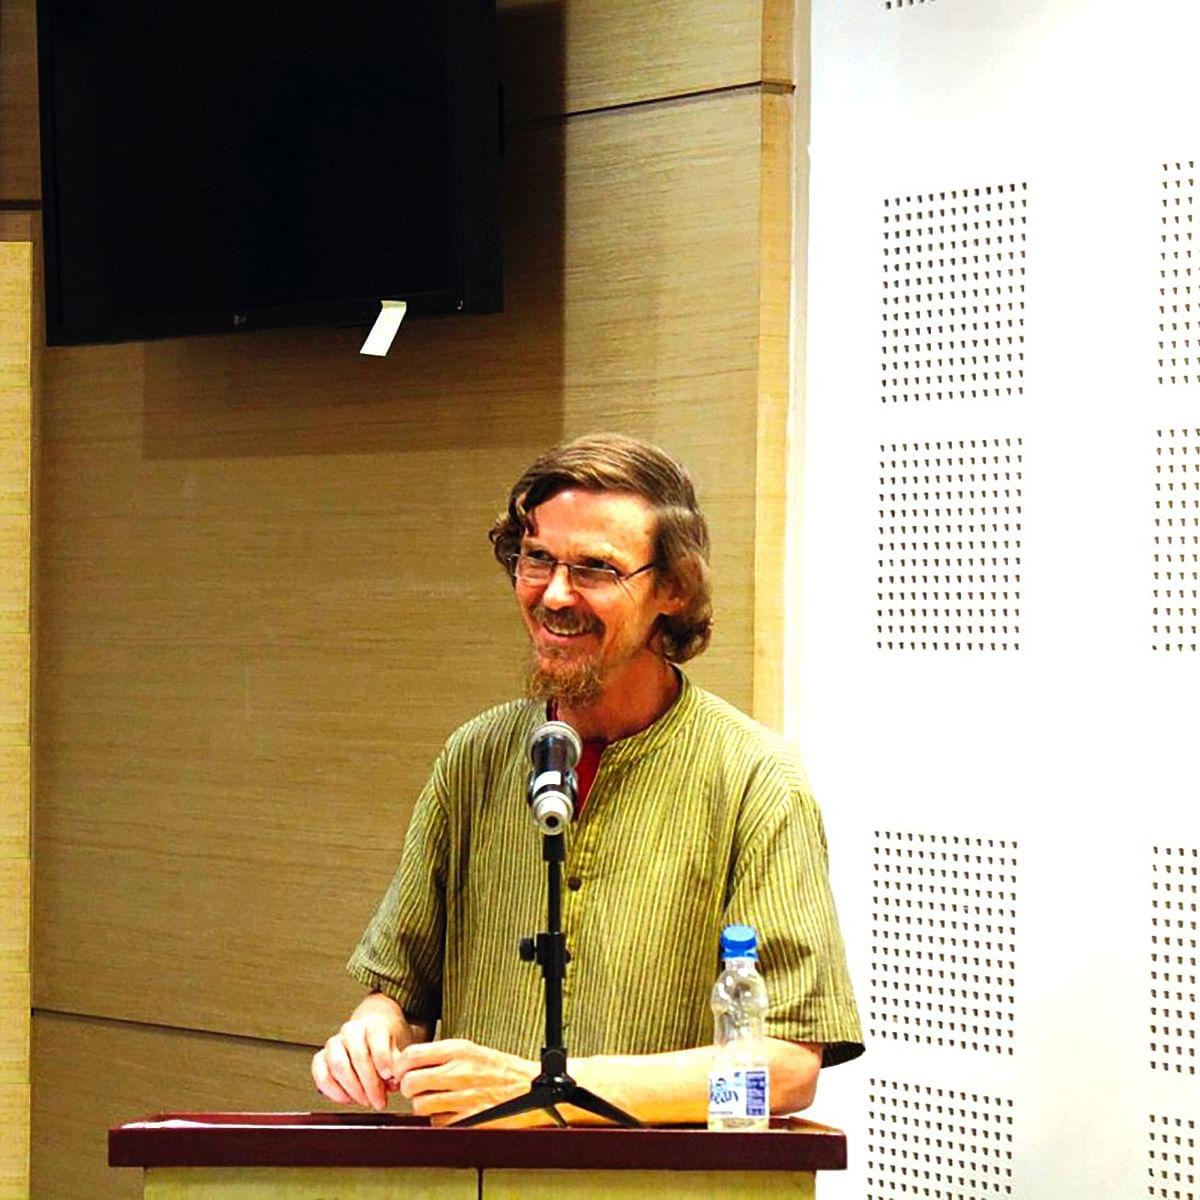 Economist Jean Drèze: Most Indians are unemployed or 'misemployed'